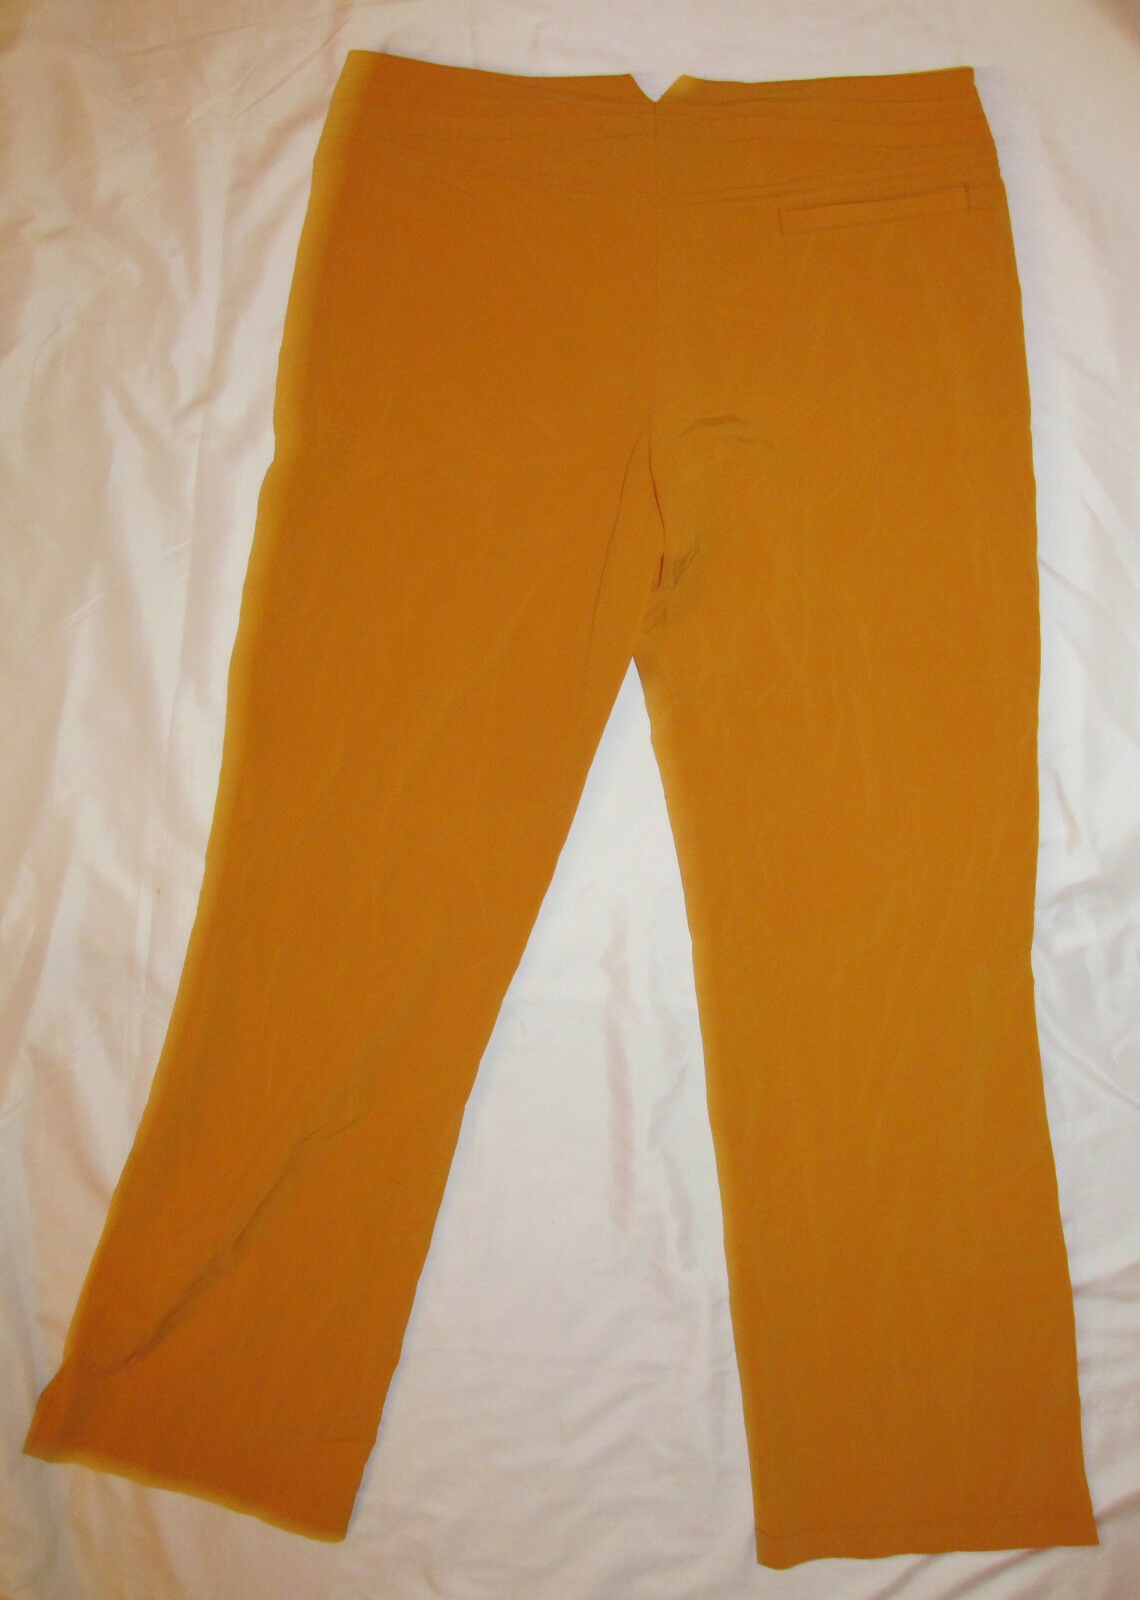 ATHLETA stretchy lightweight silk feel drawstring wide leg mustard yellow pants